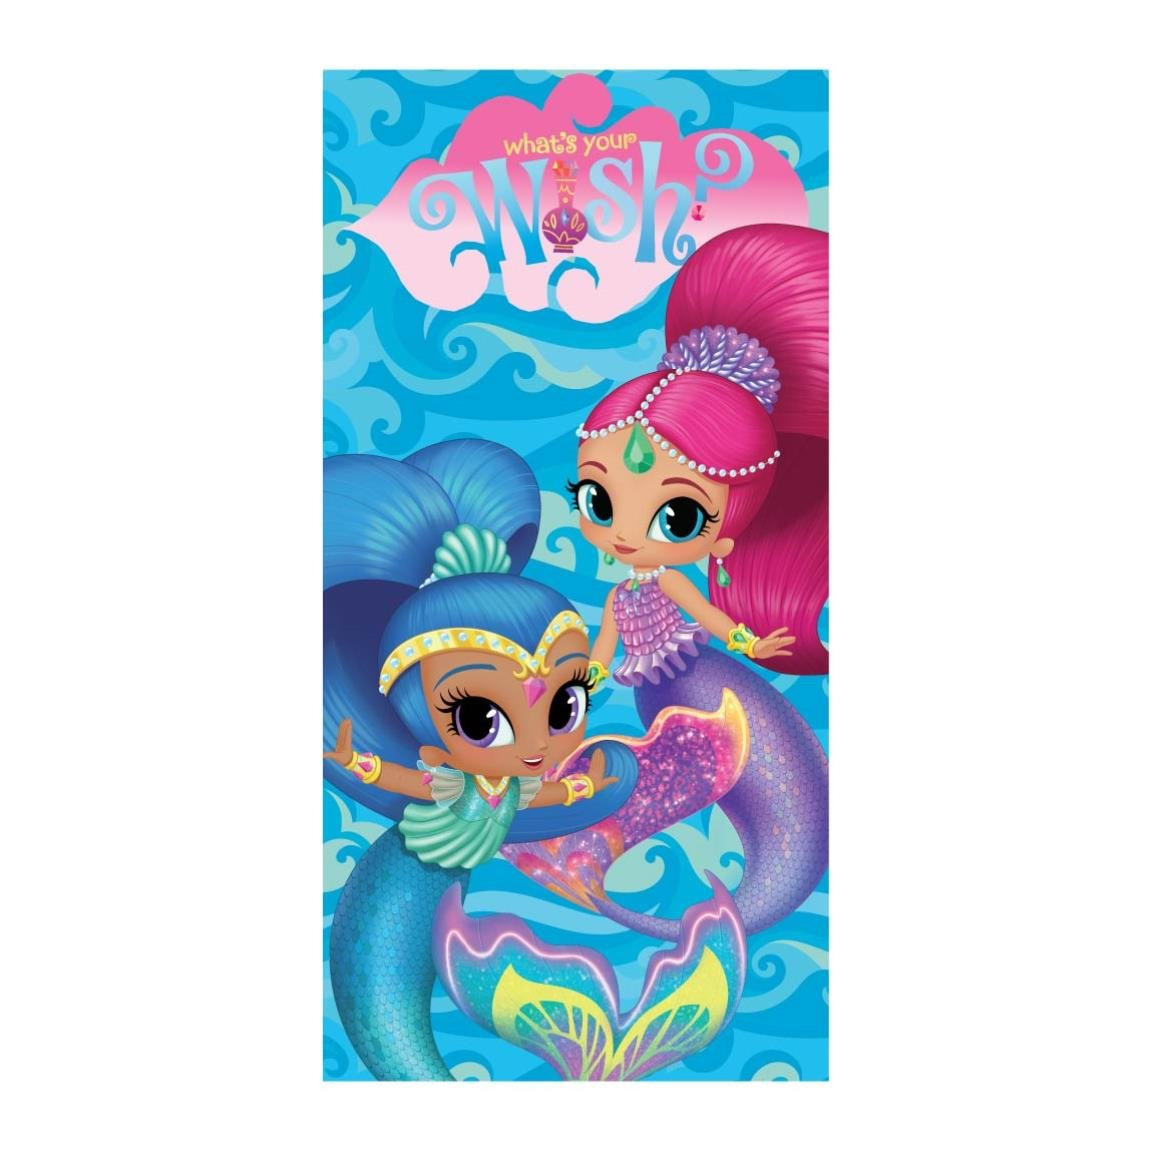 Shimmer and Shine 2200002932 - Toalla playa y piscina Artesania Cerda